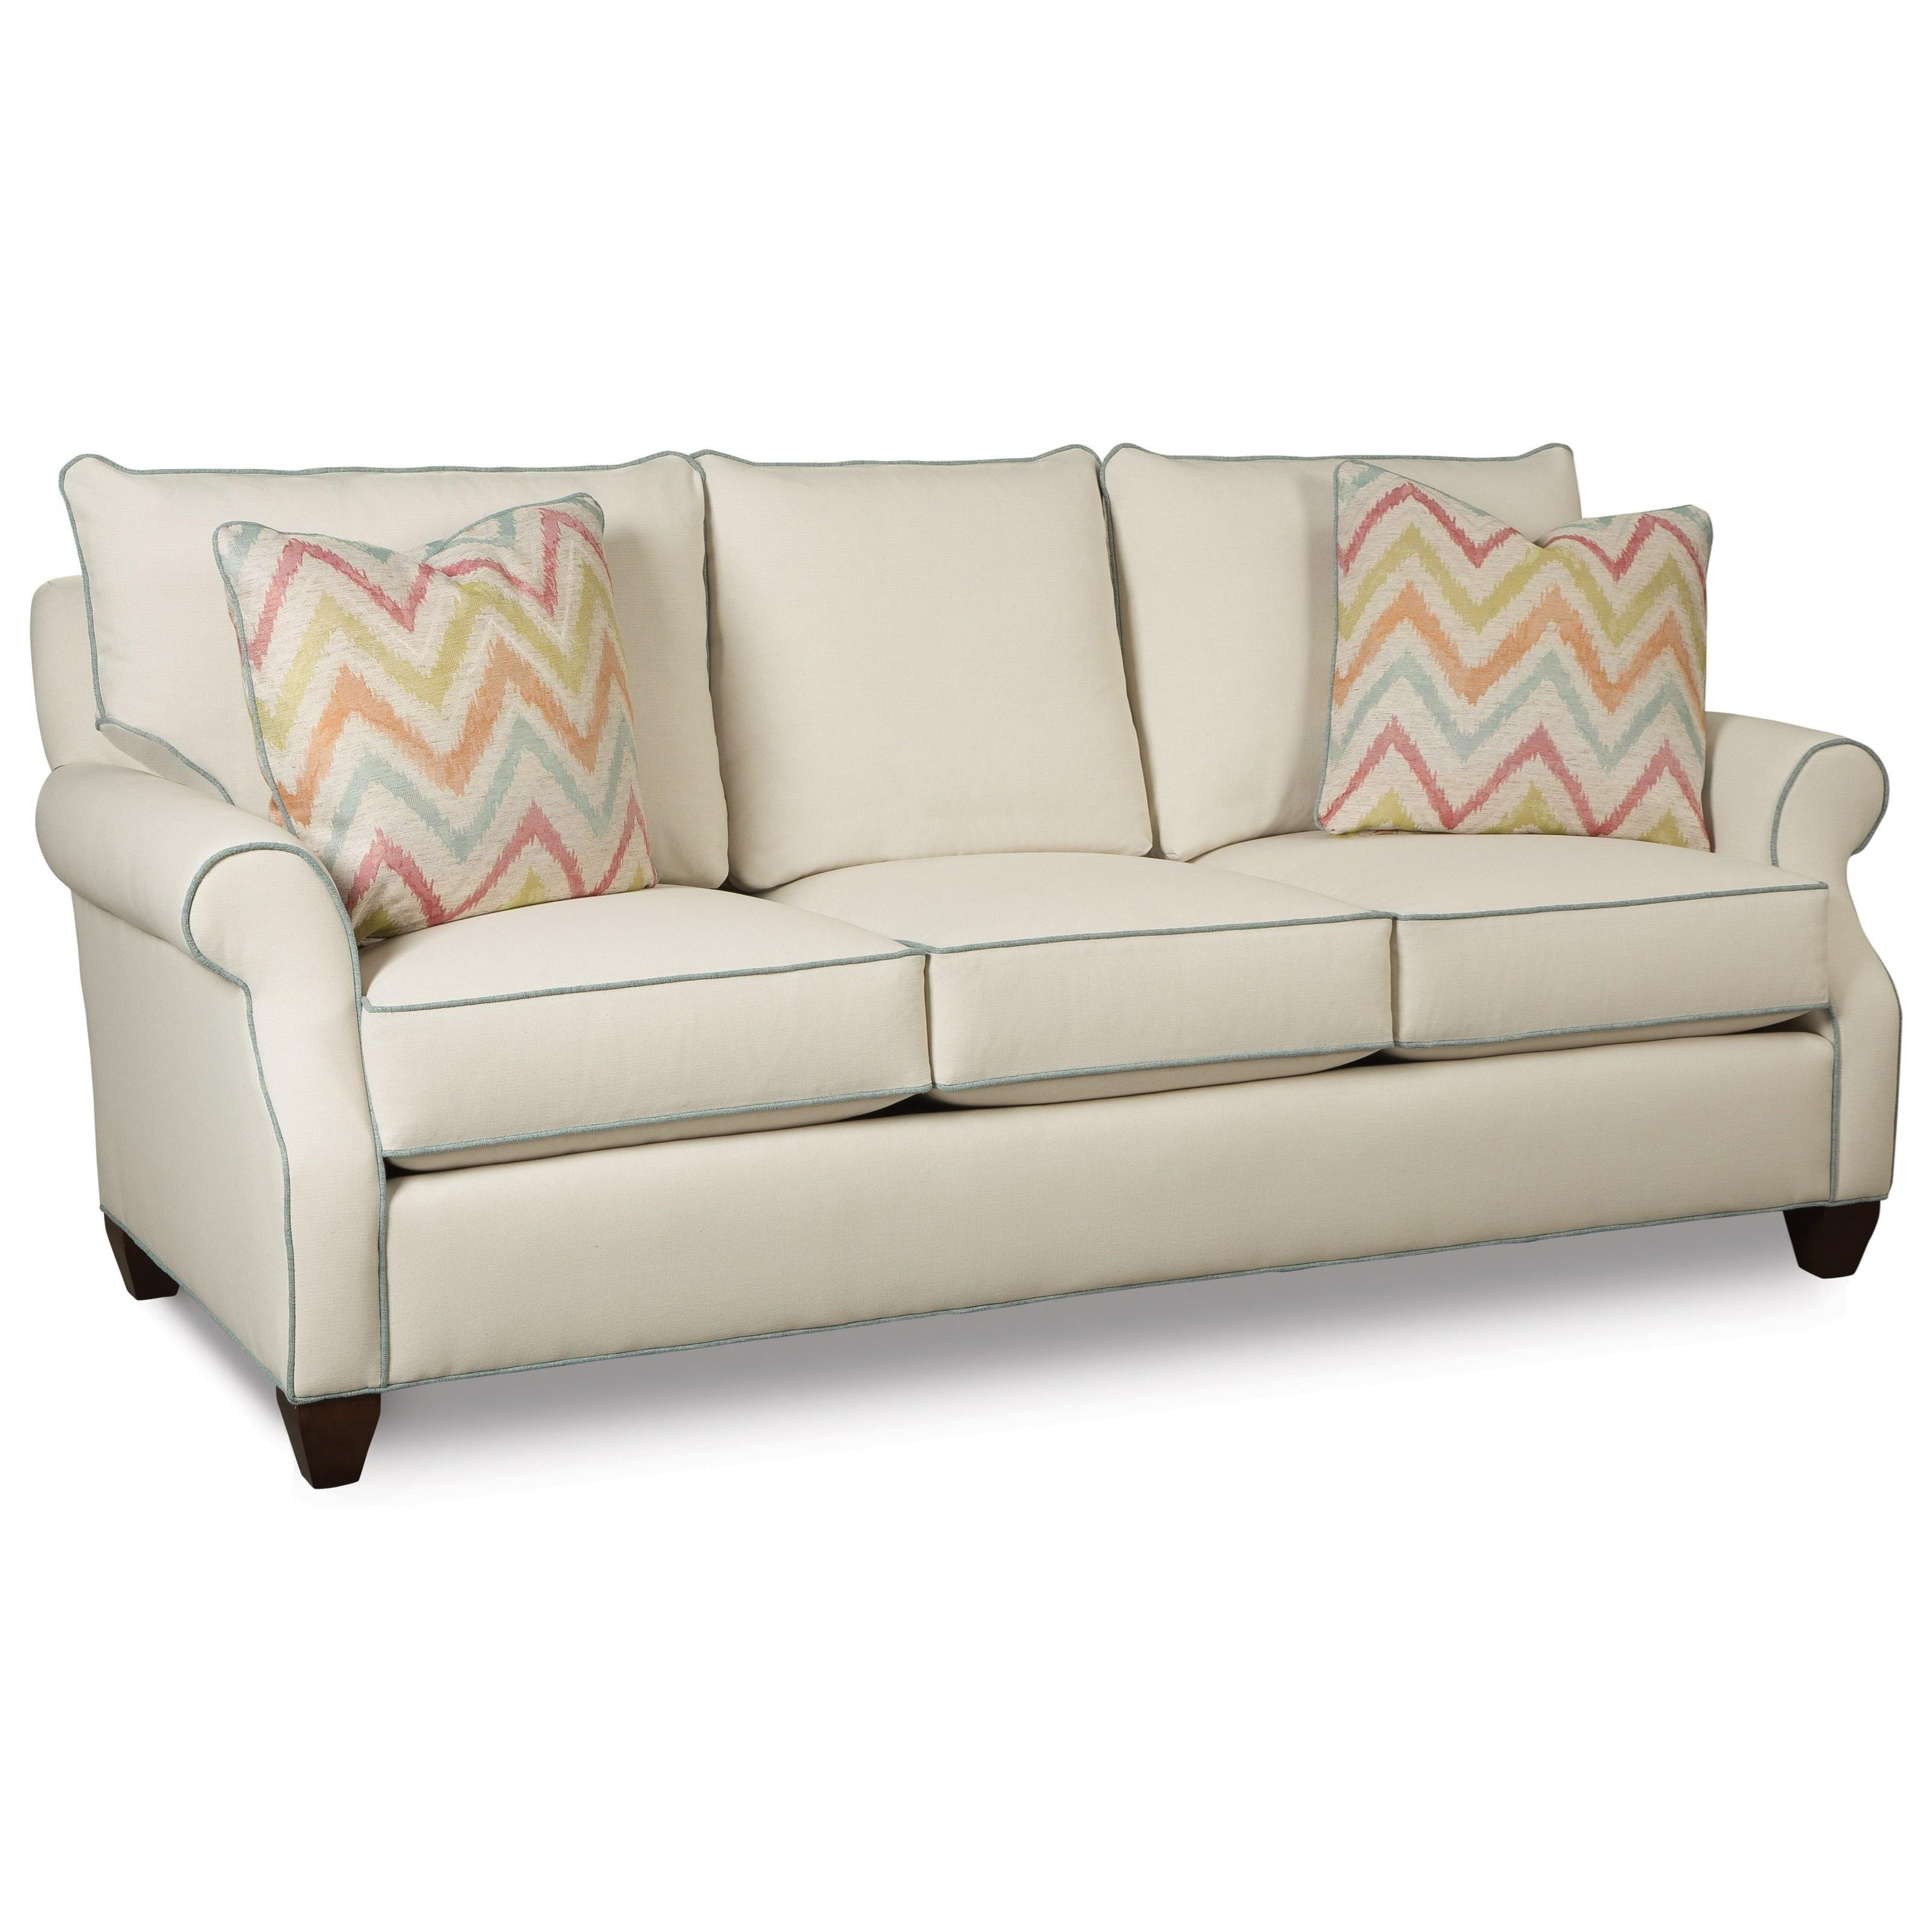 2051 Sofa by Huntington House at Belfort Furniture